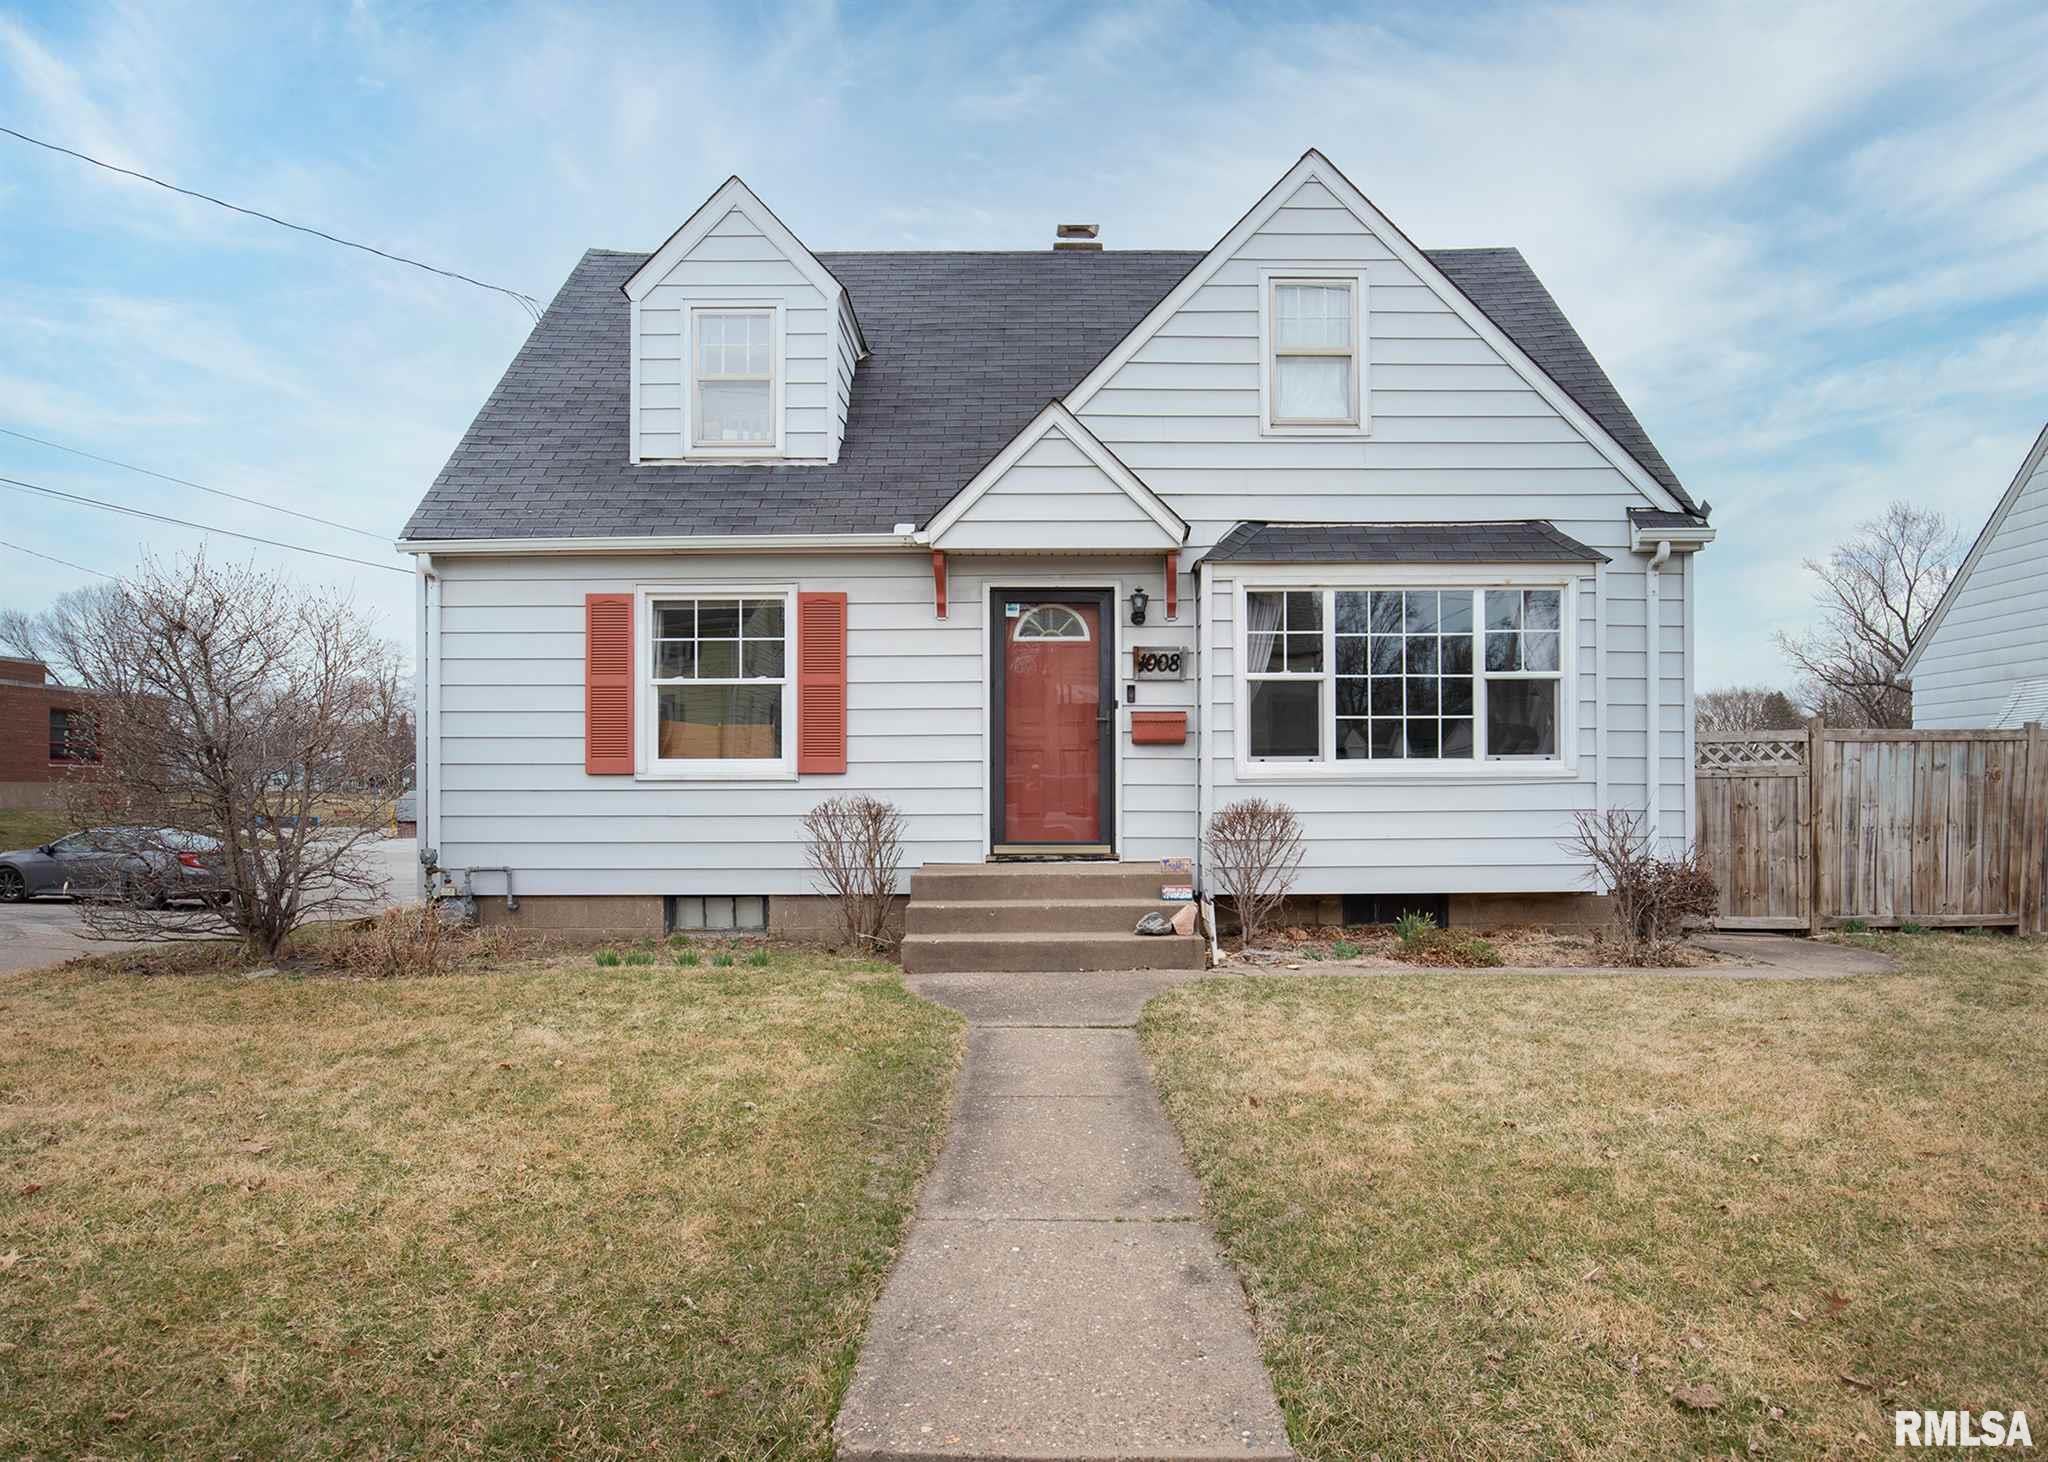 1008 E 29TH Property Photo - Davenport, IA real estate listing